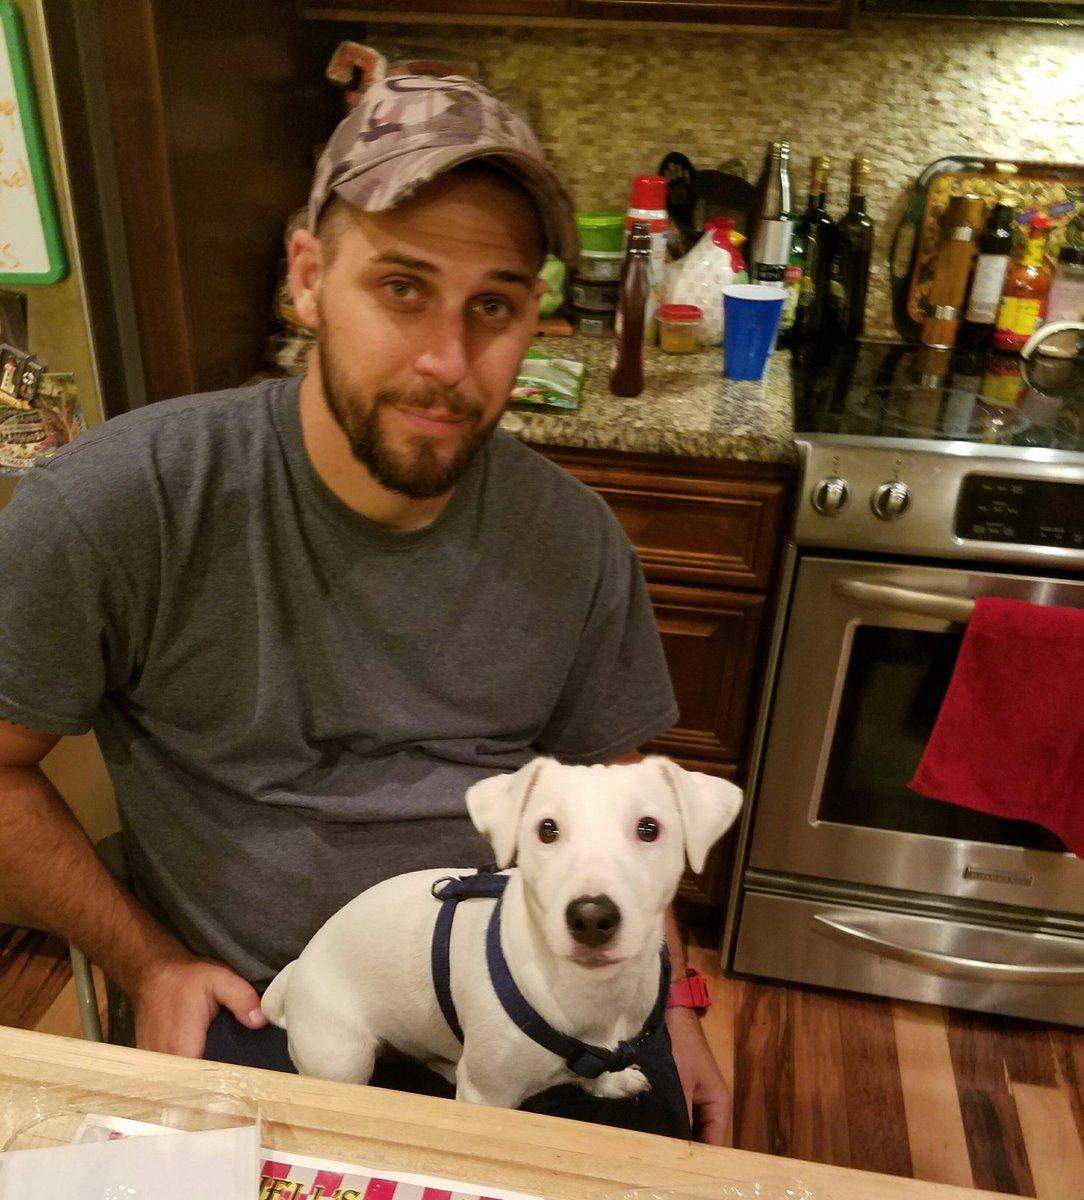 I love my boys #JimmyTheJack @gimpyfarmer #dogsoftwitter